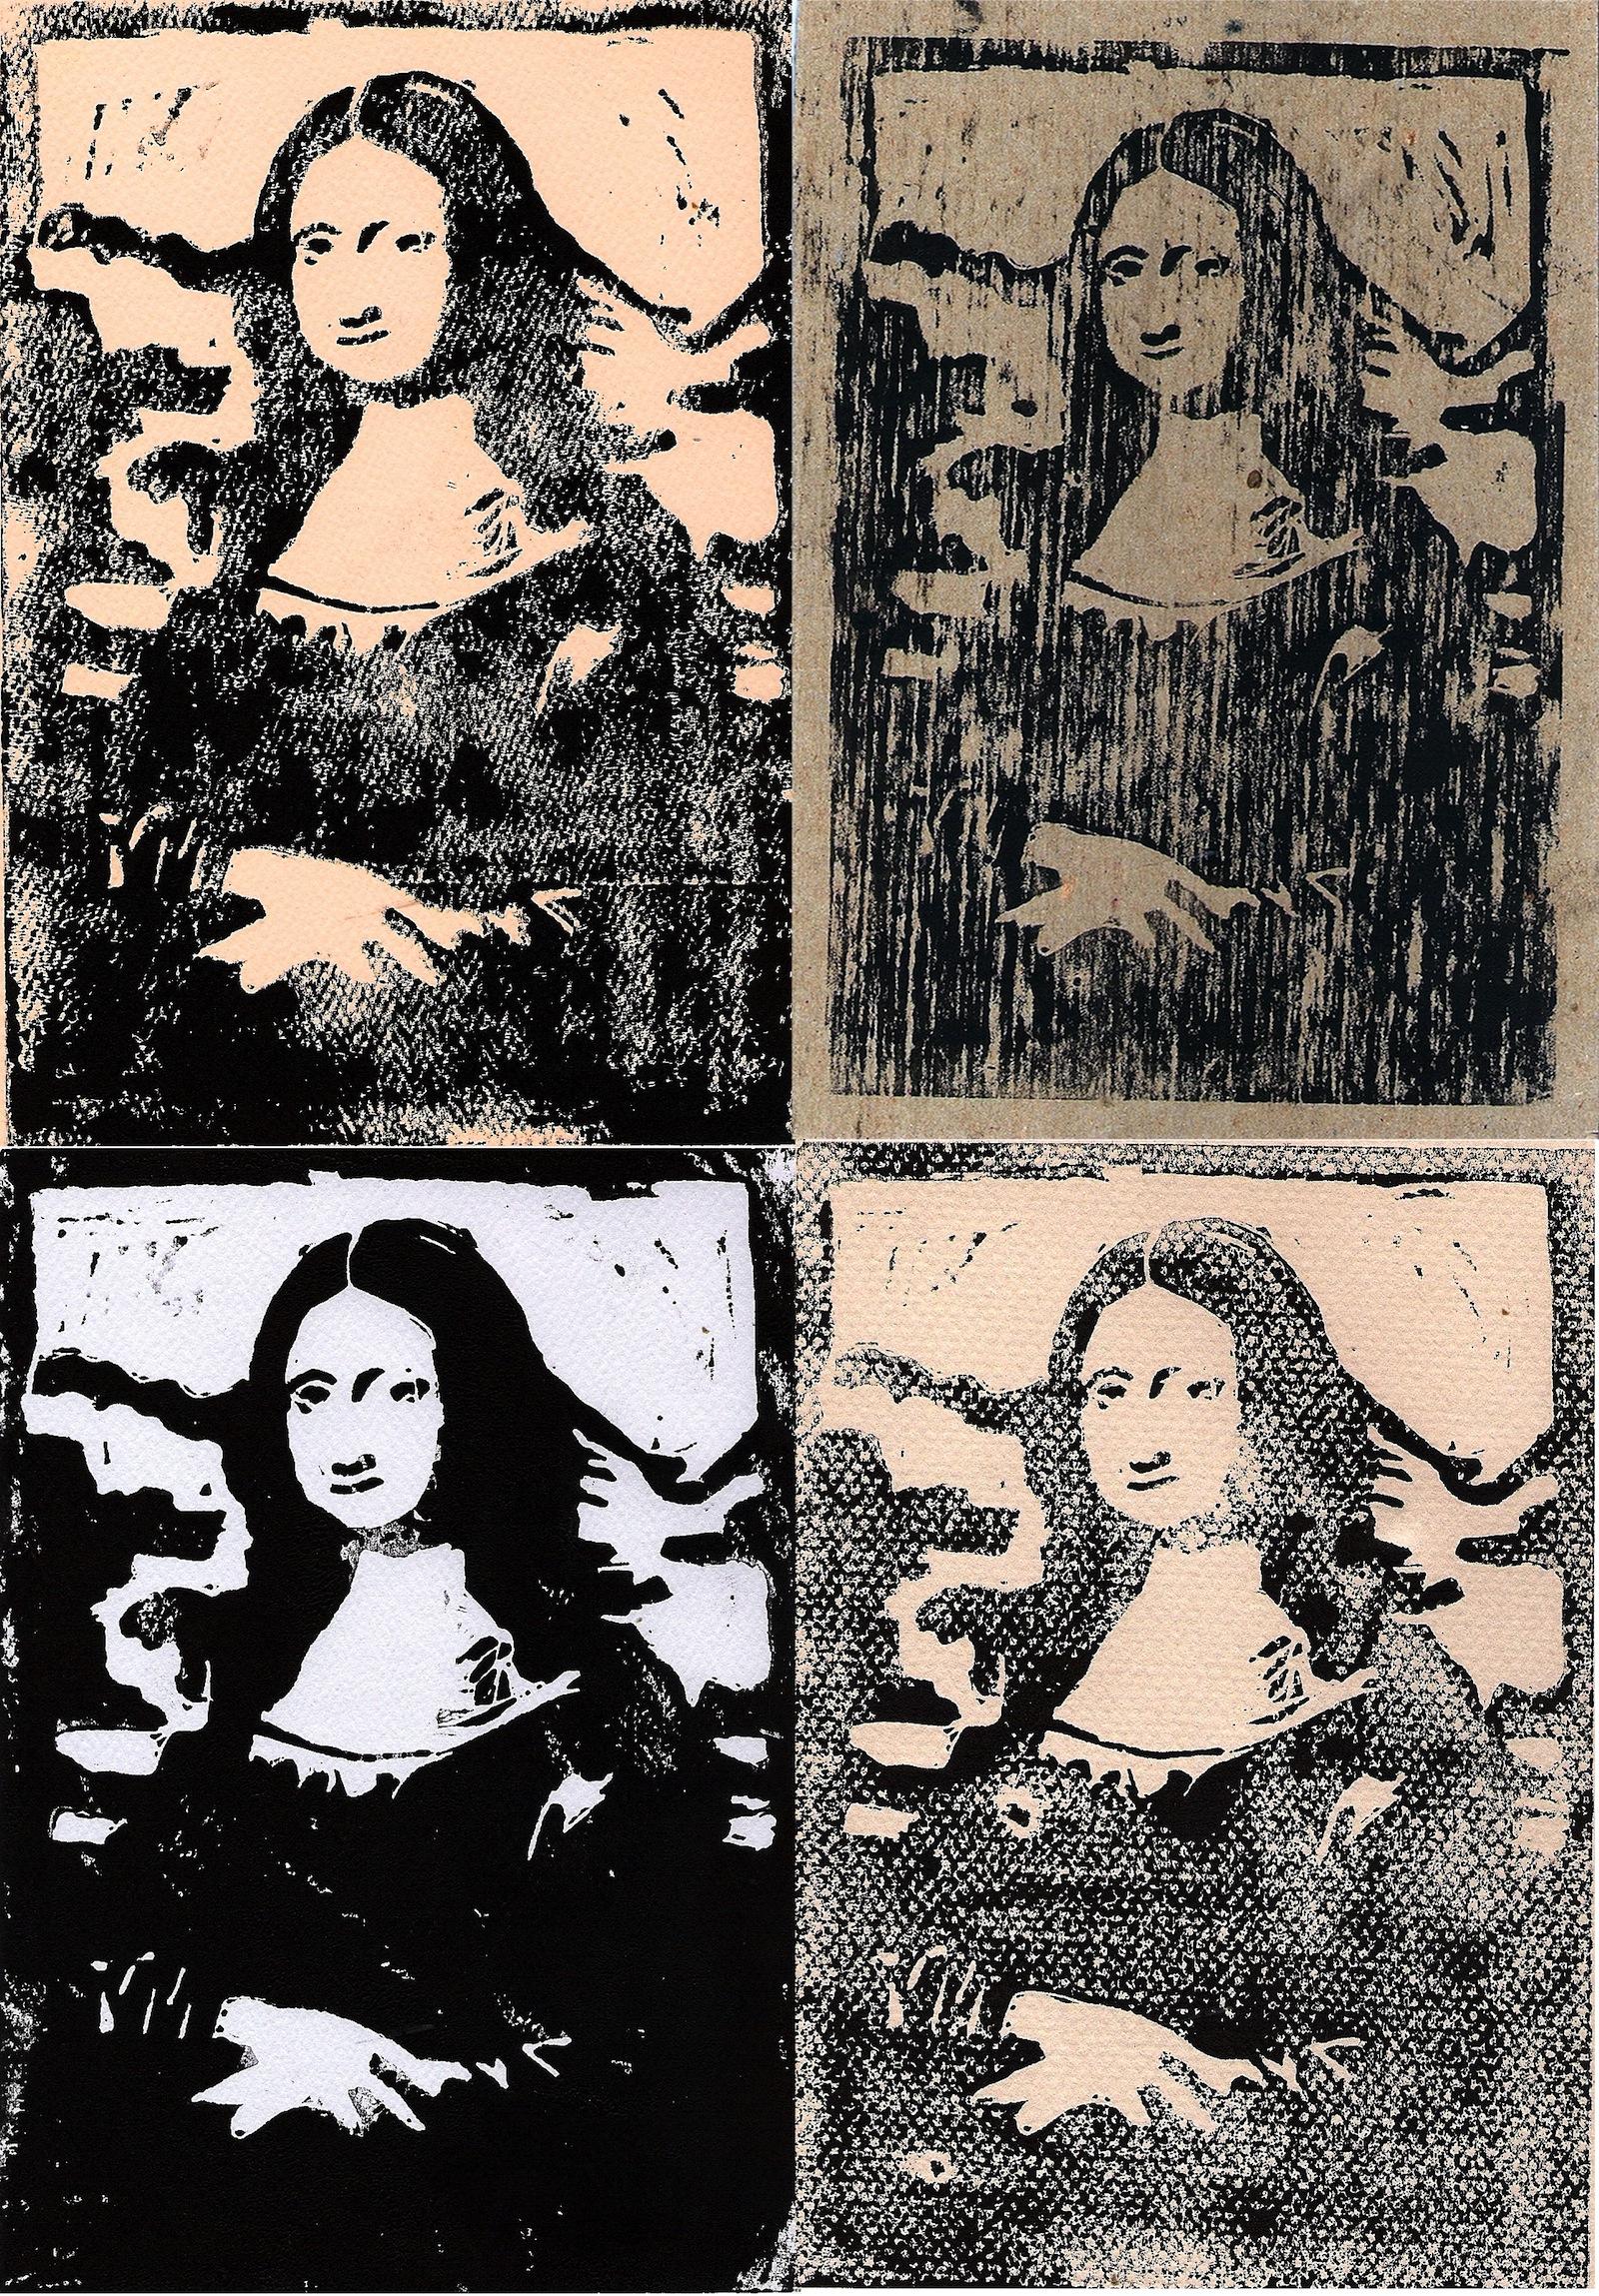 Mona Lisa Linocut